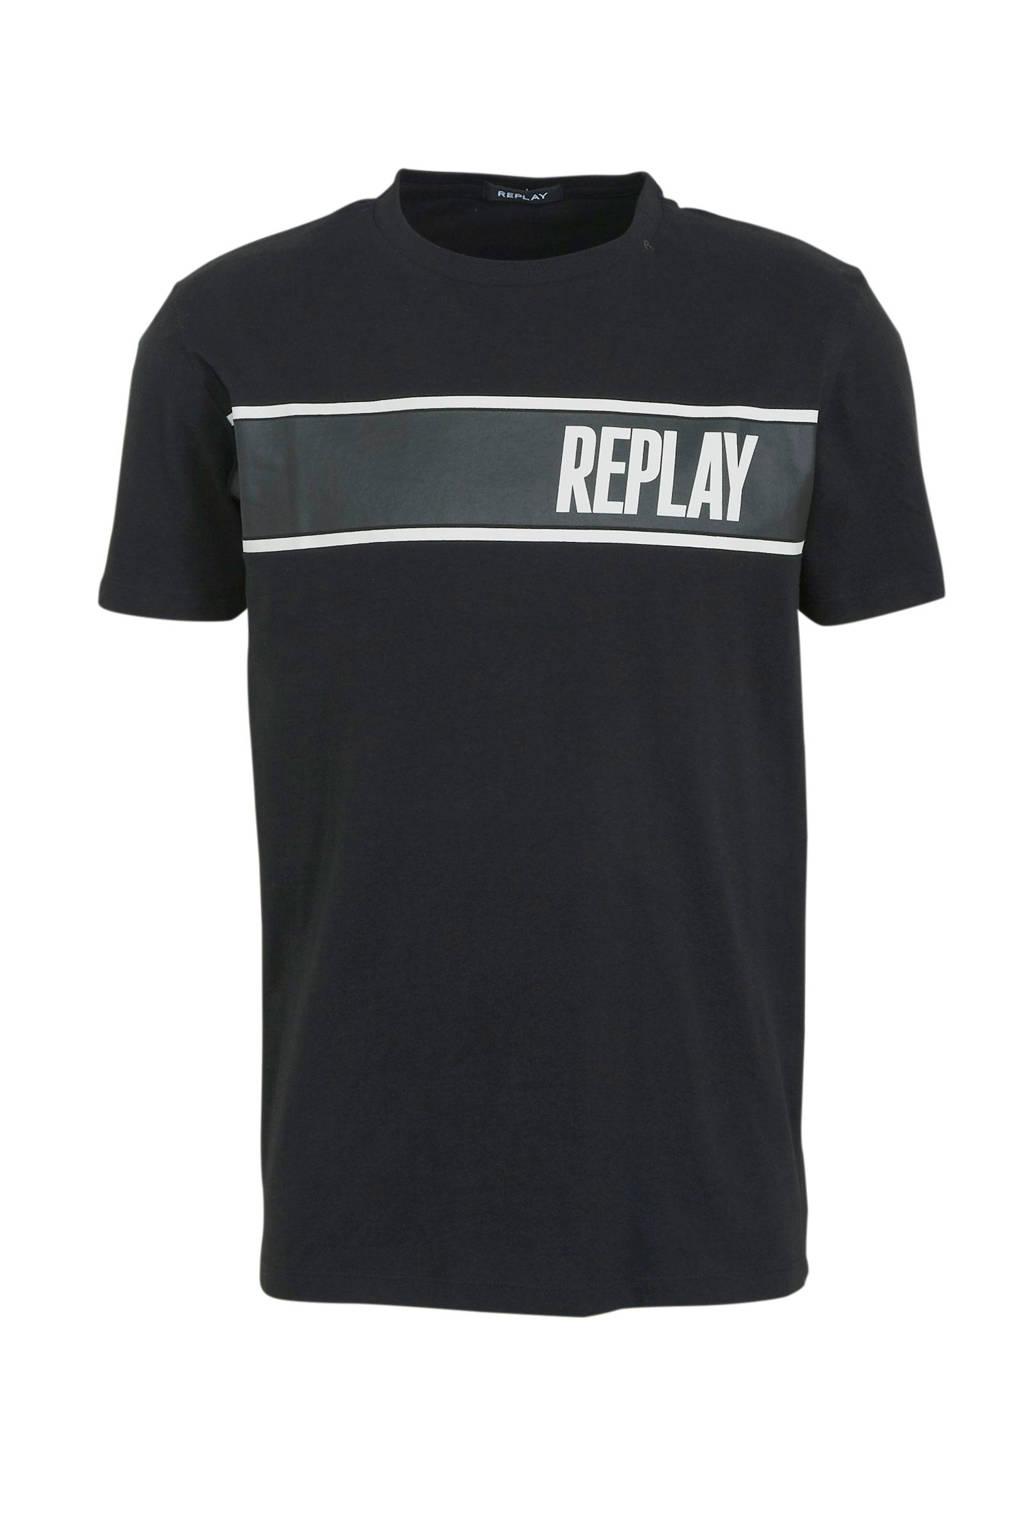 REPLAY T-shirt met printopdruk zwart, Zwart